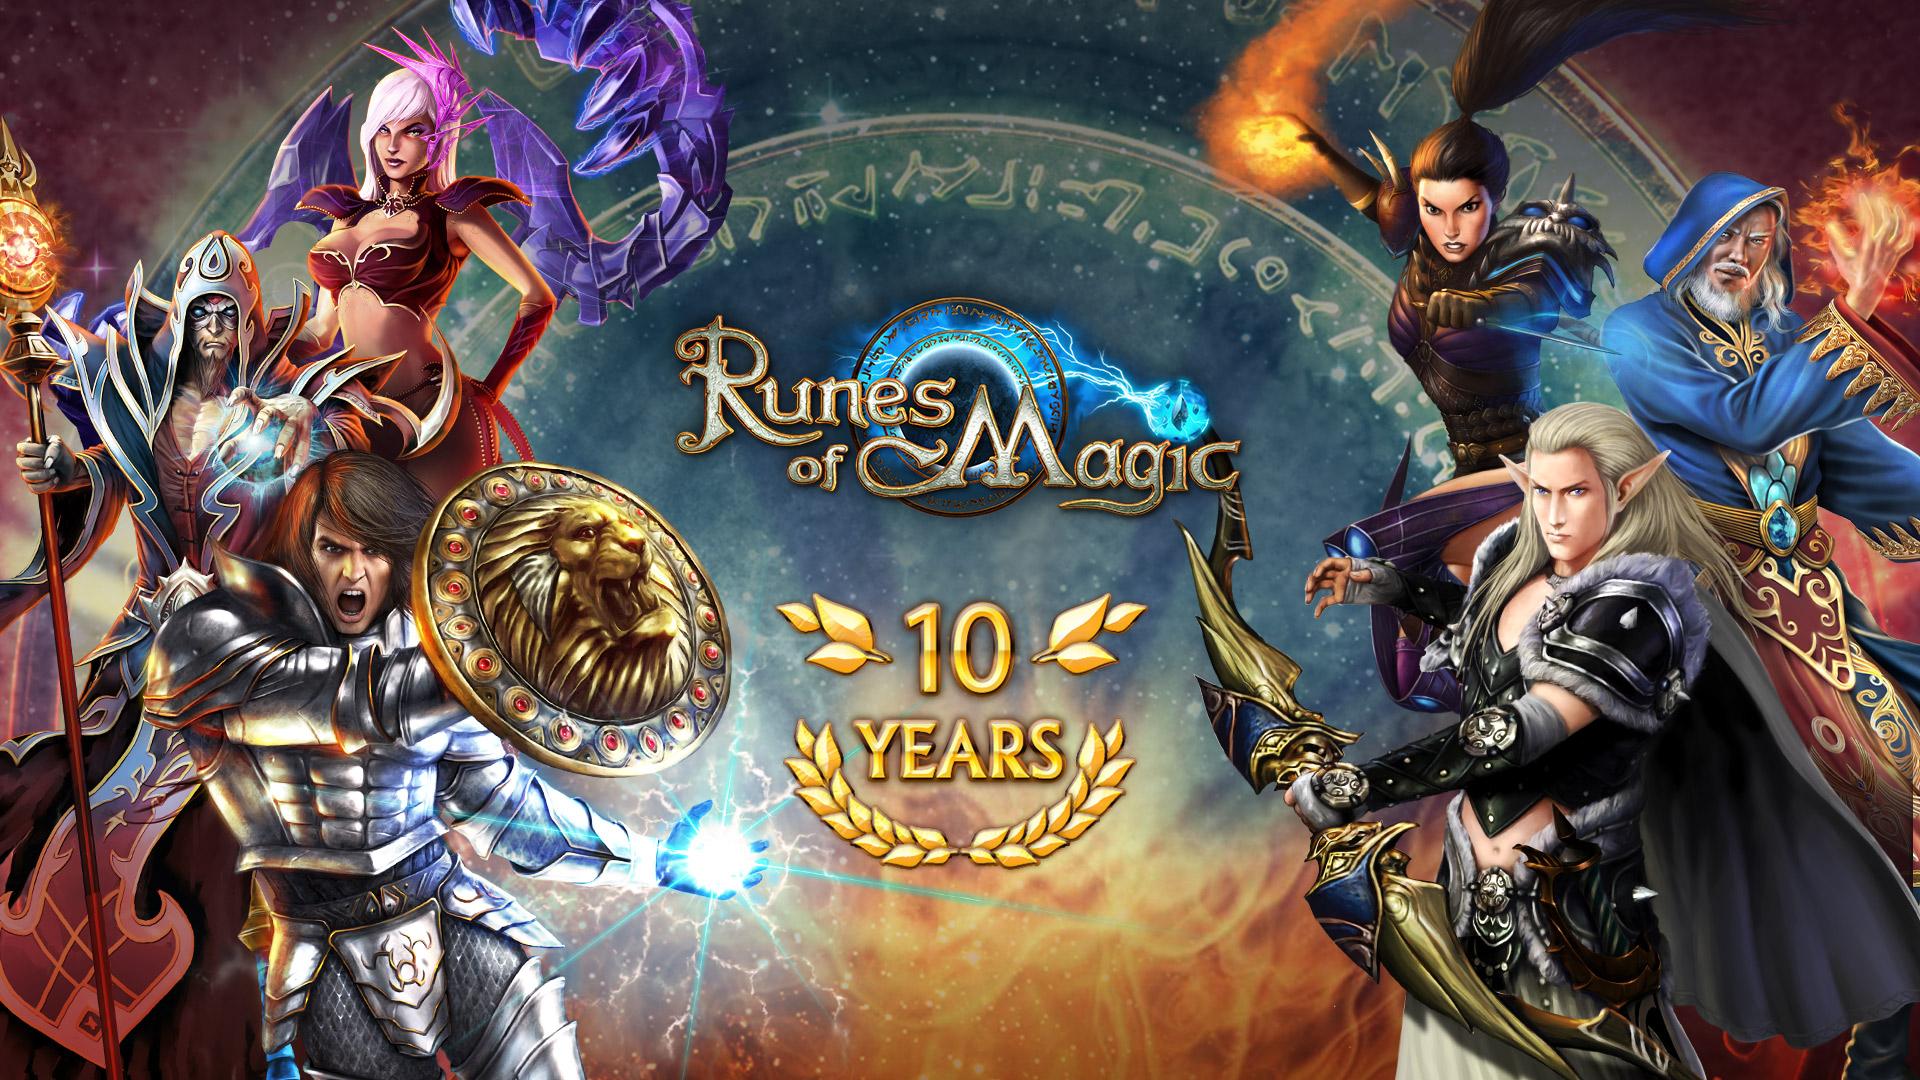 runewaker-y-gameforge-celebran-10-anos-de-runes-of-magic-con-un-impresionante-festival-de-aniversario-frikigamers.com